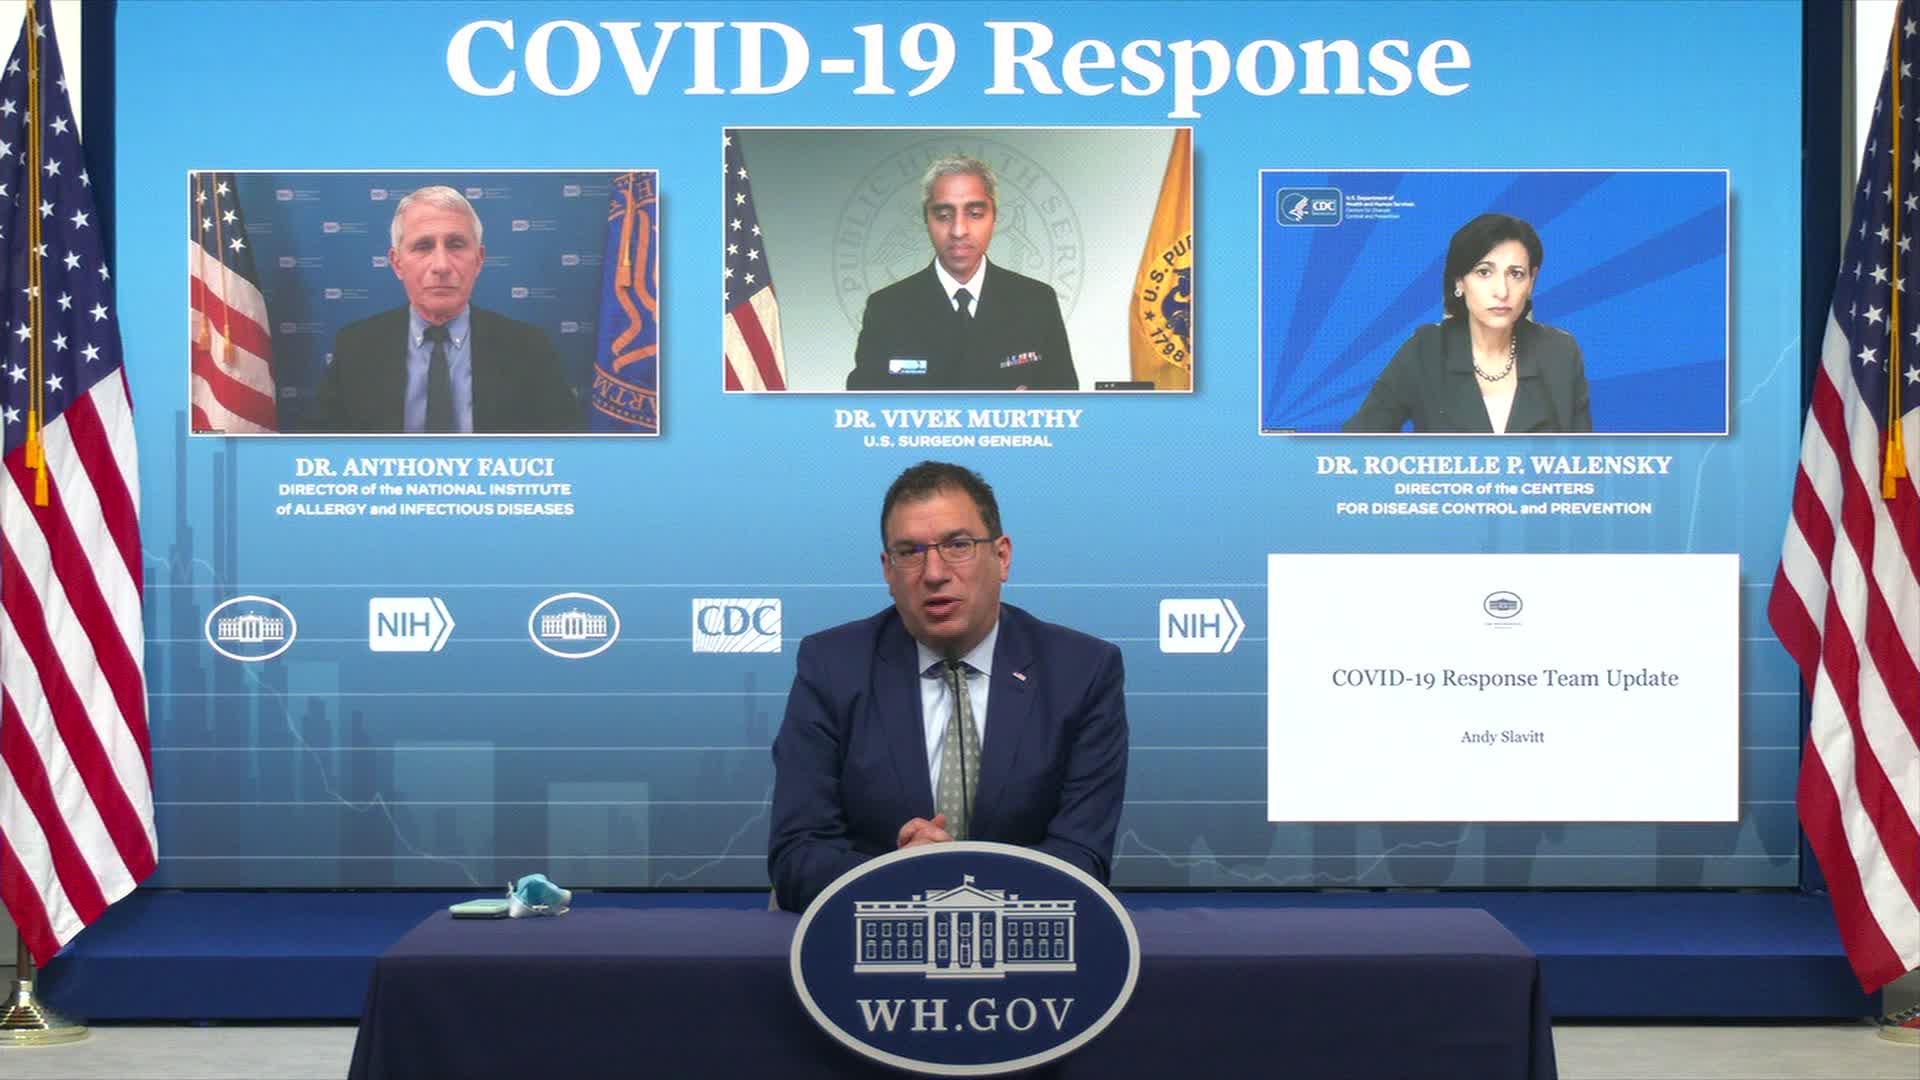 White House Covid-19 senior adviser Andy Slavitt, front, speaks at a briefing on April 16.